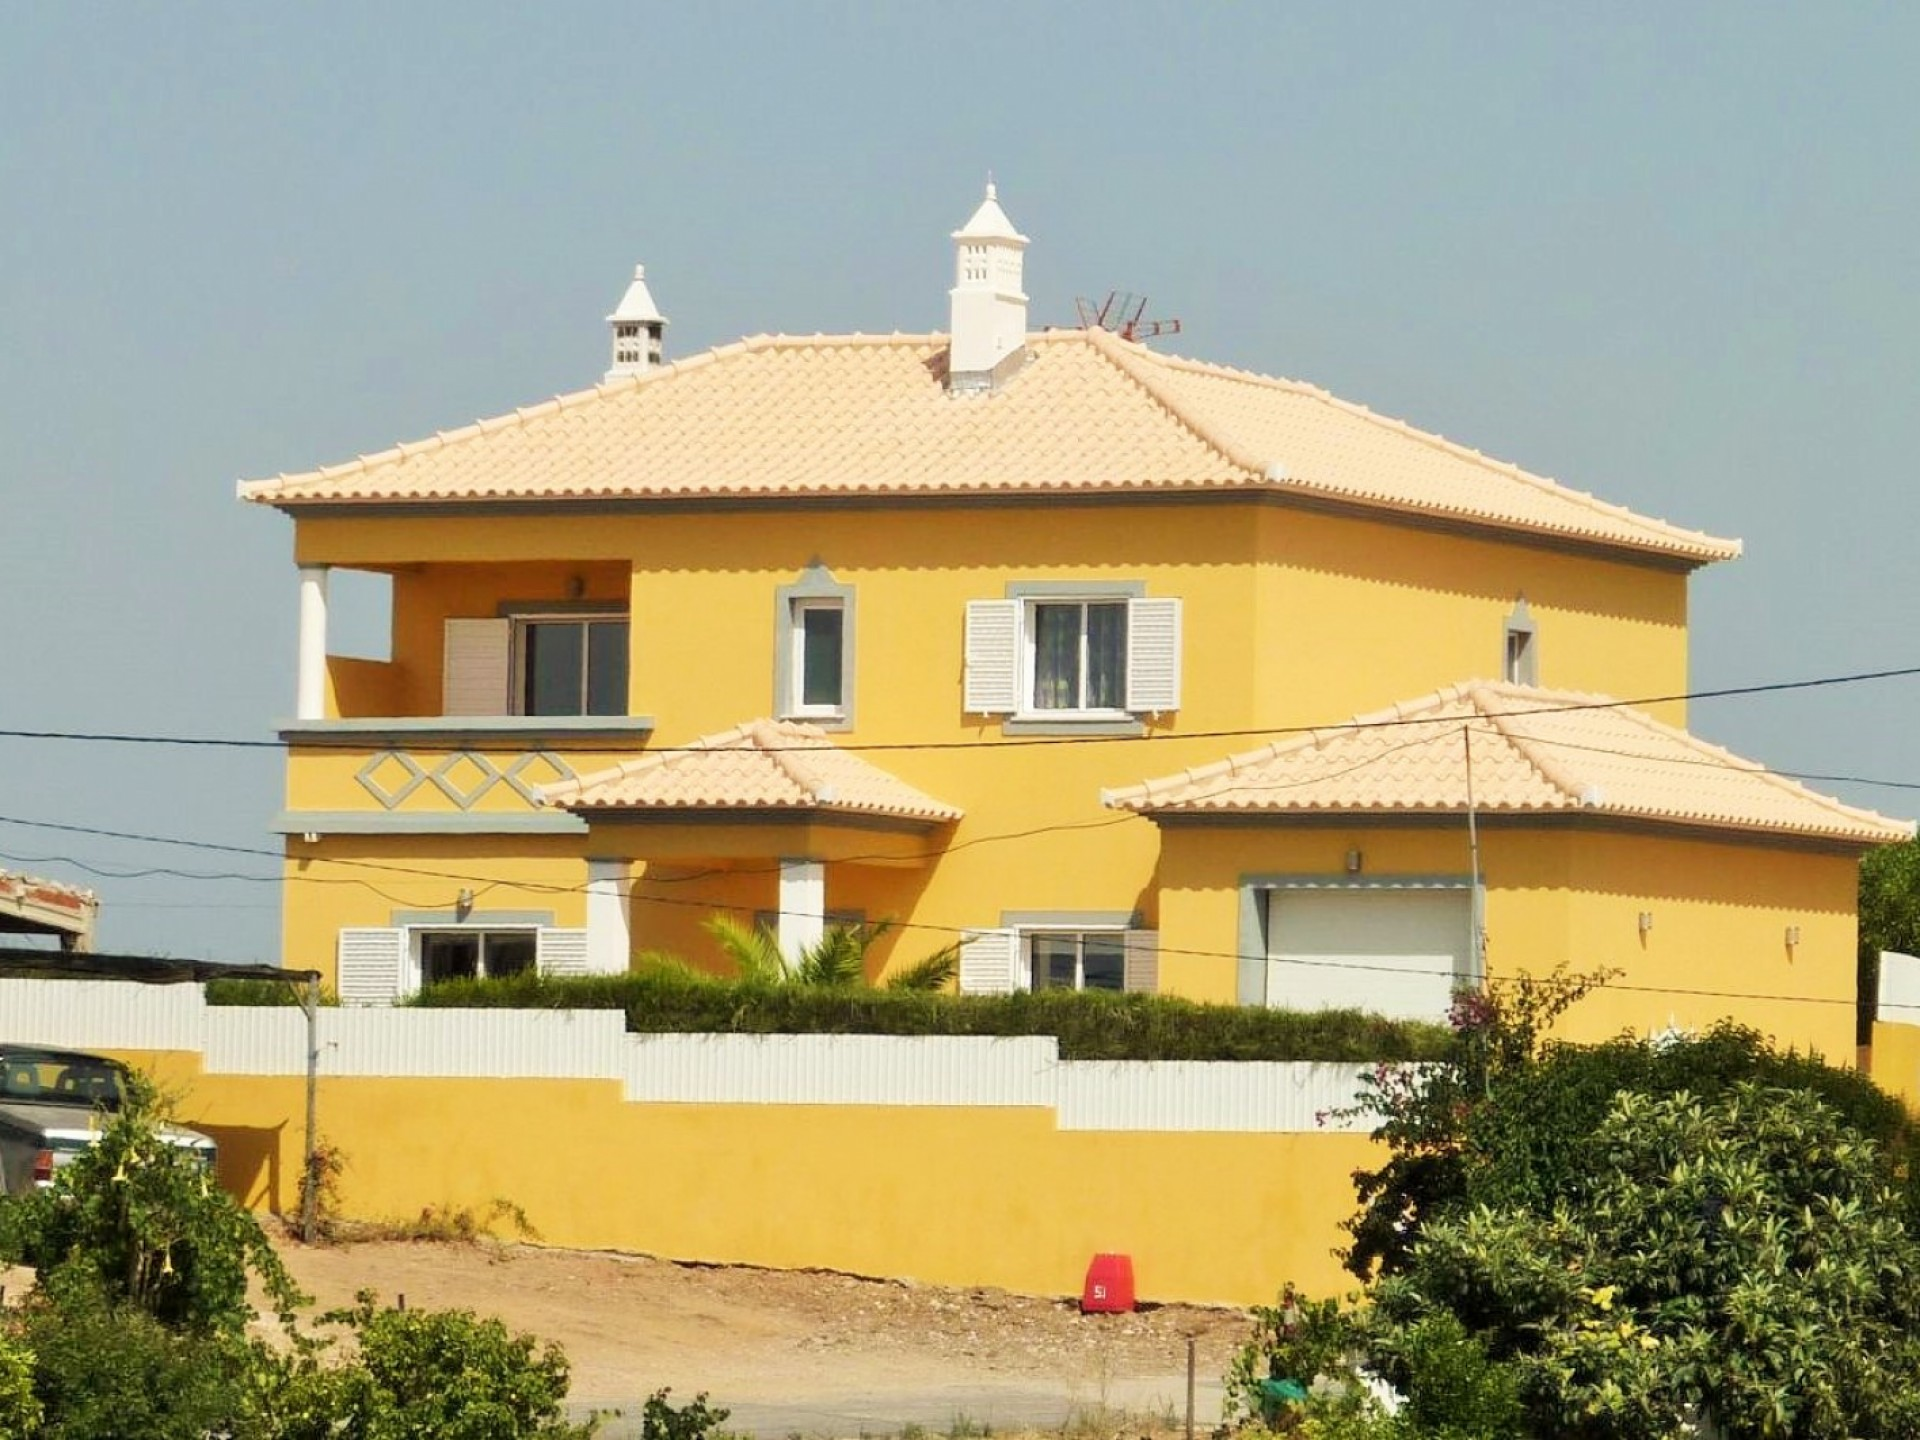 e820fc85c1b85 Biens à vendre - Portugal Installation Conseil